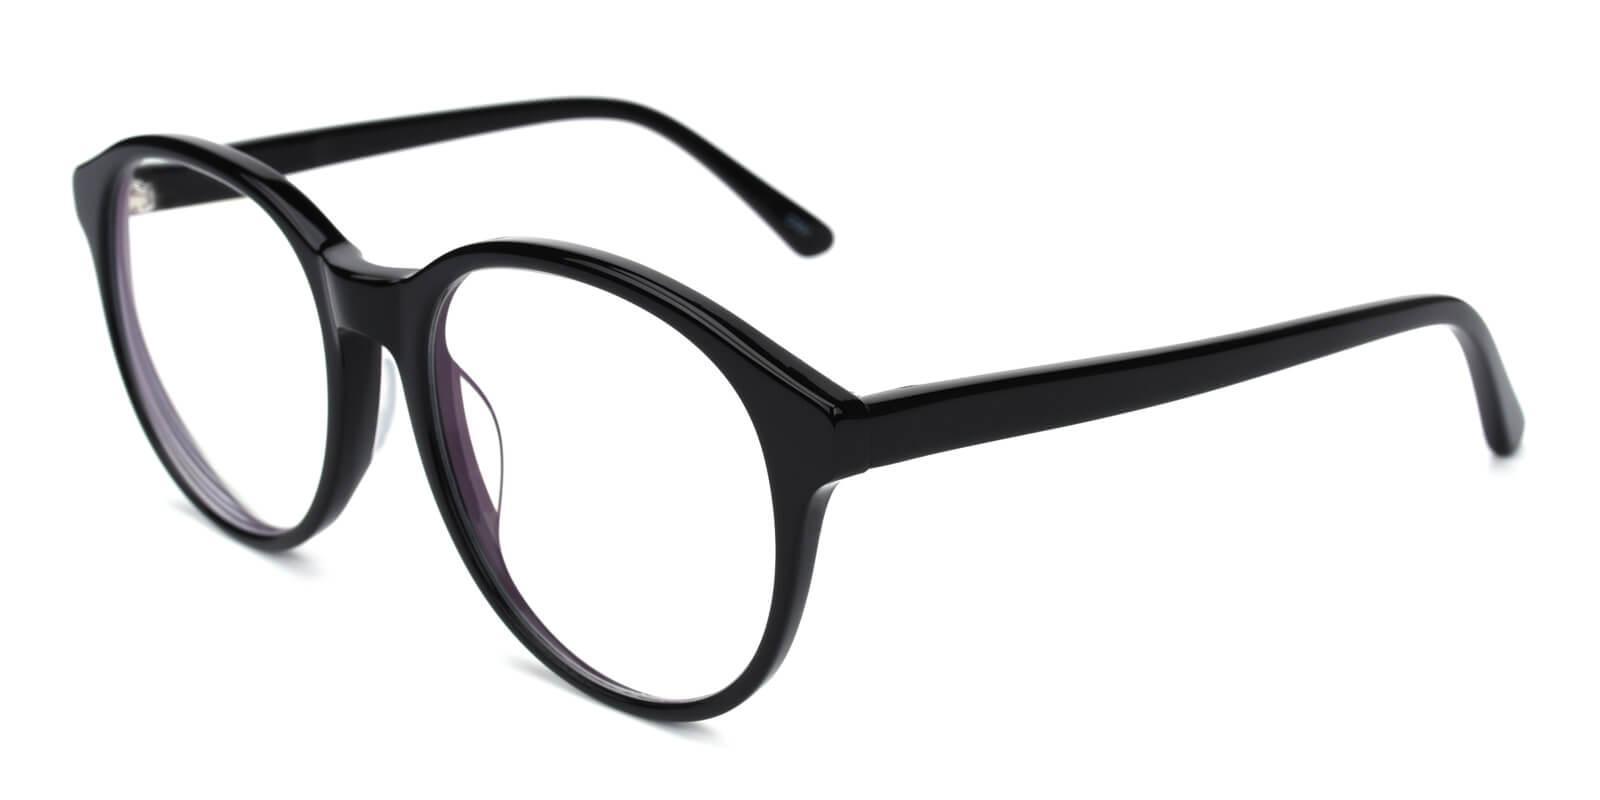 Bellona-Black-Round-Acetate-Eyeglasses-detail